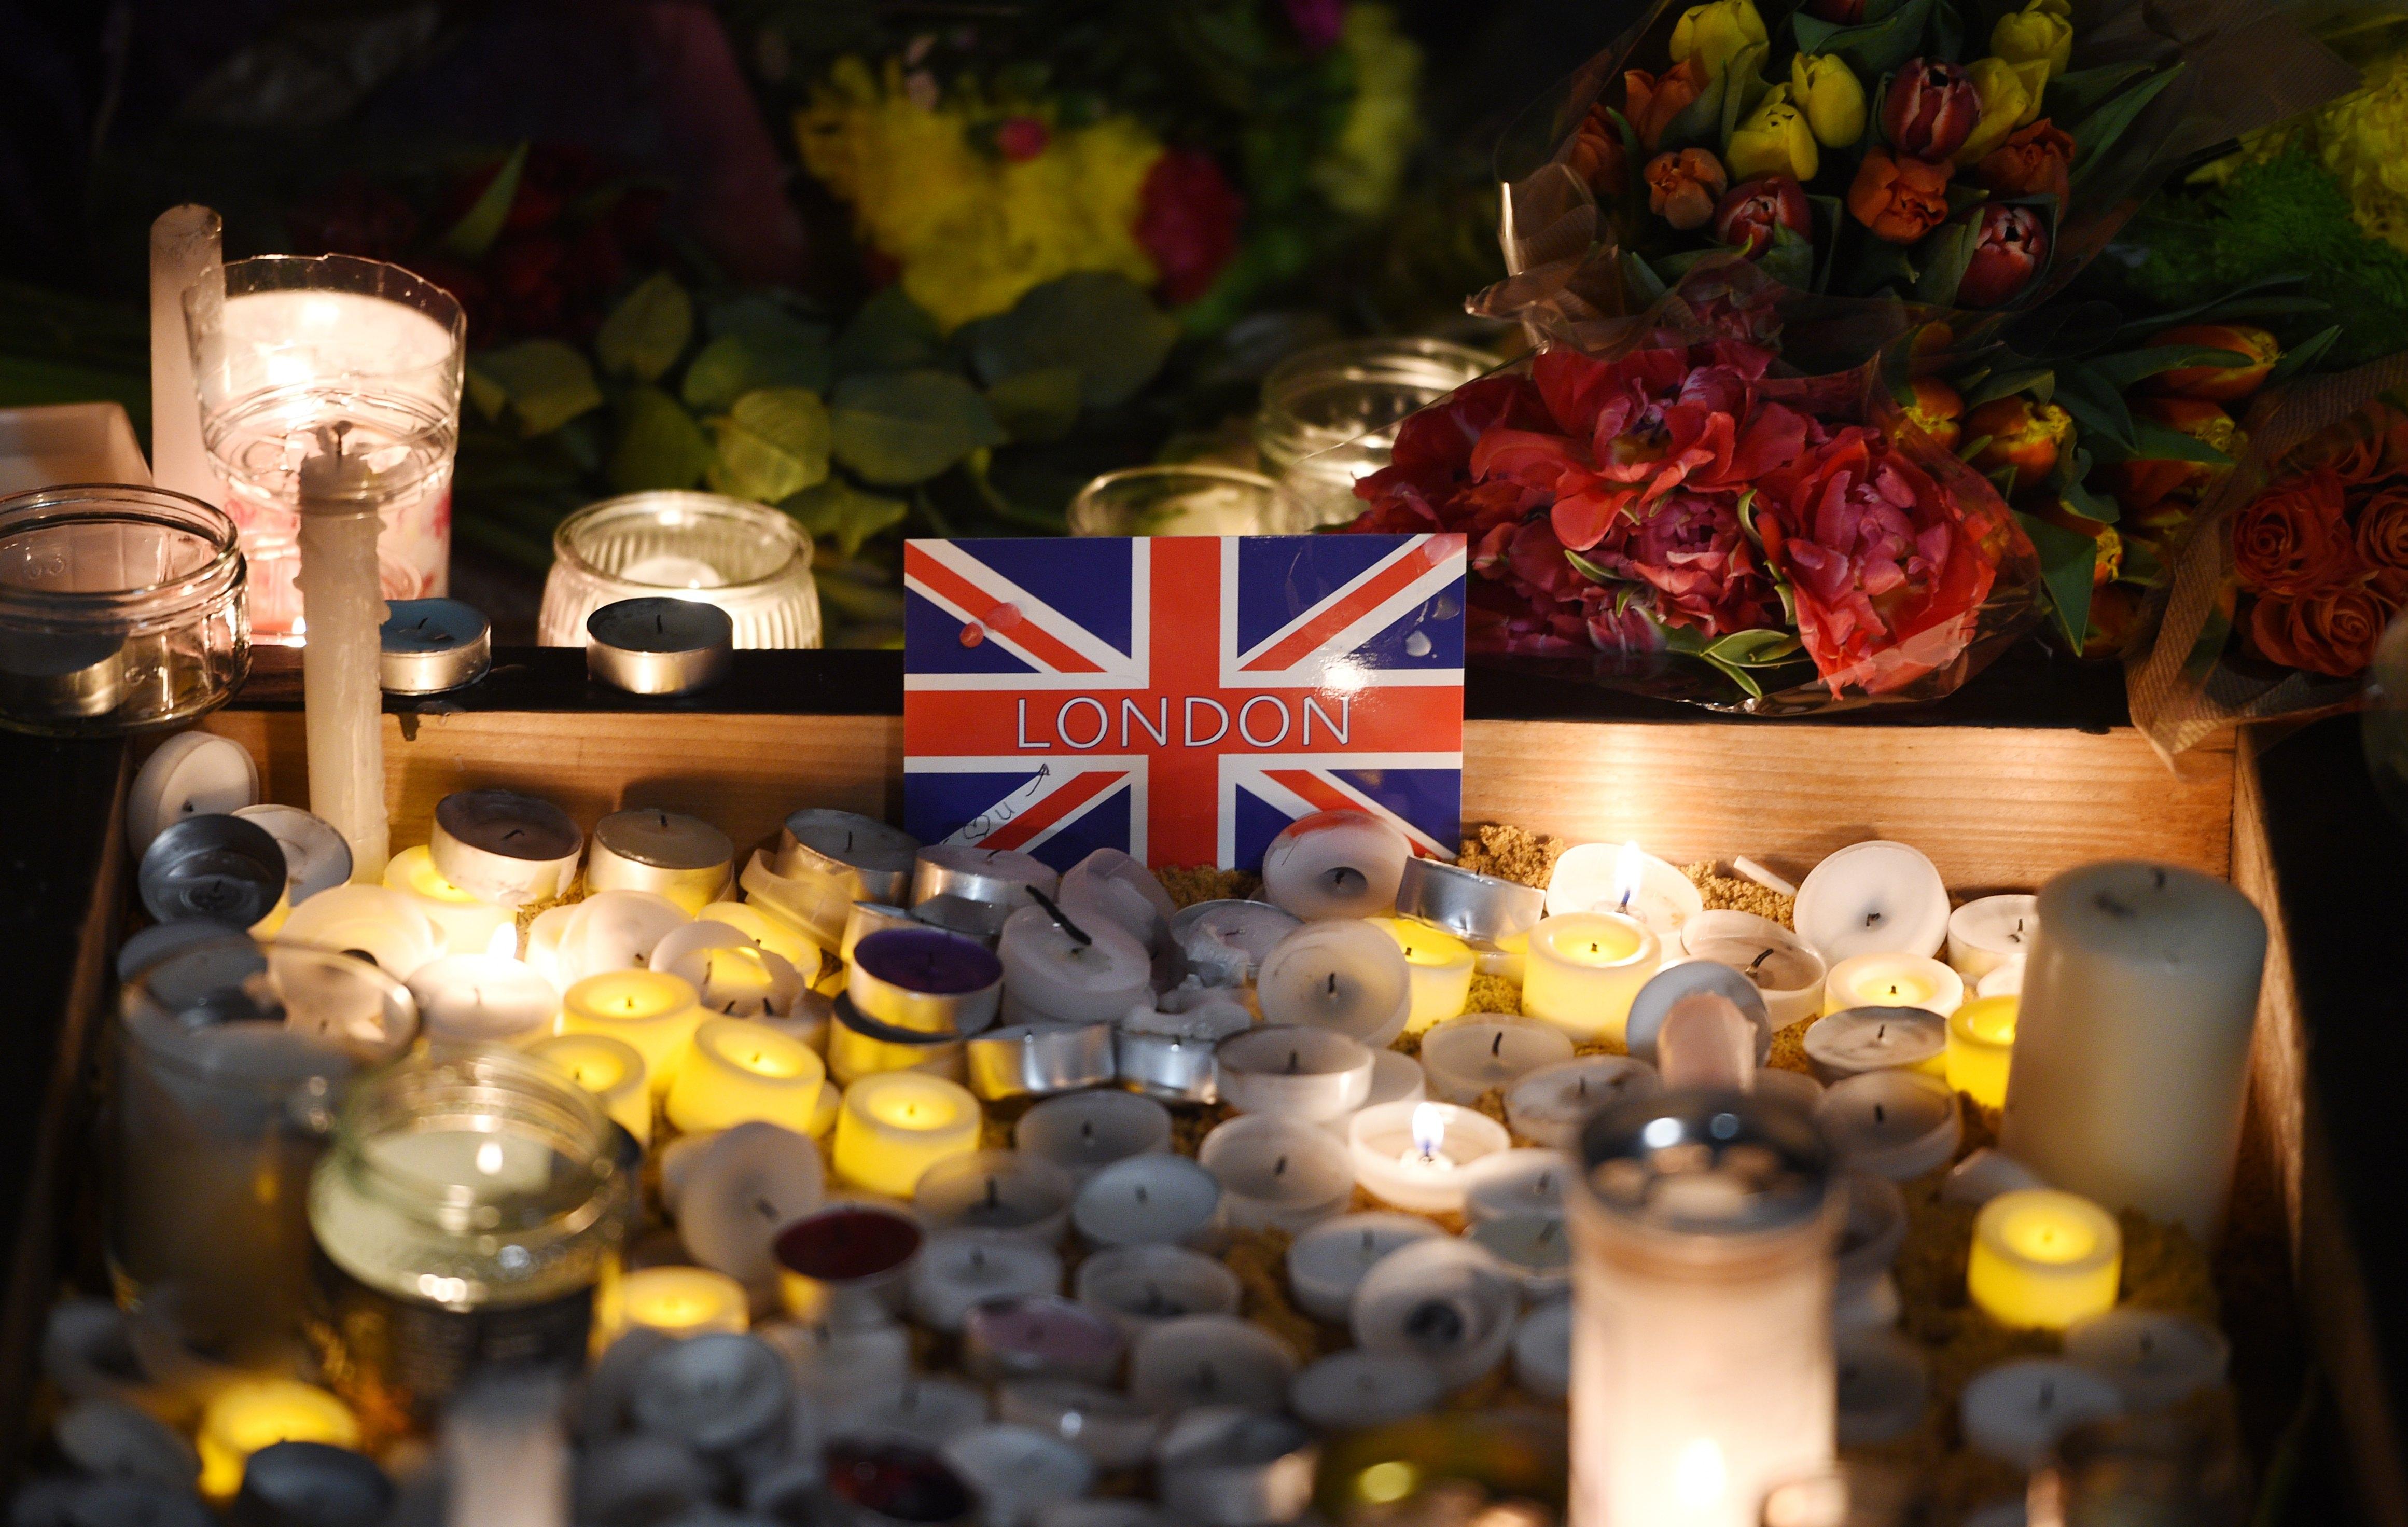 Candles are lit during a vigil in Trafalgar Square in London, Britain, 23 March 2017. EPA/FACUNDO ARRIZABALAGA